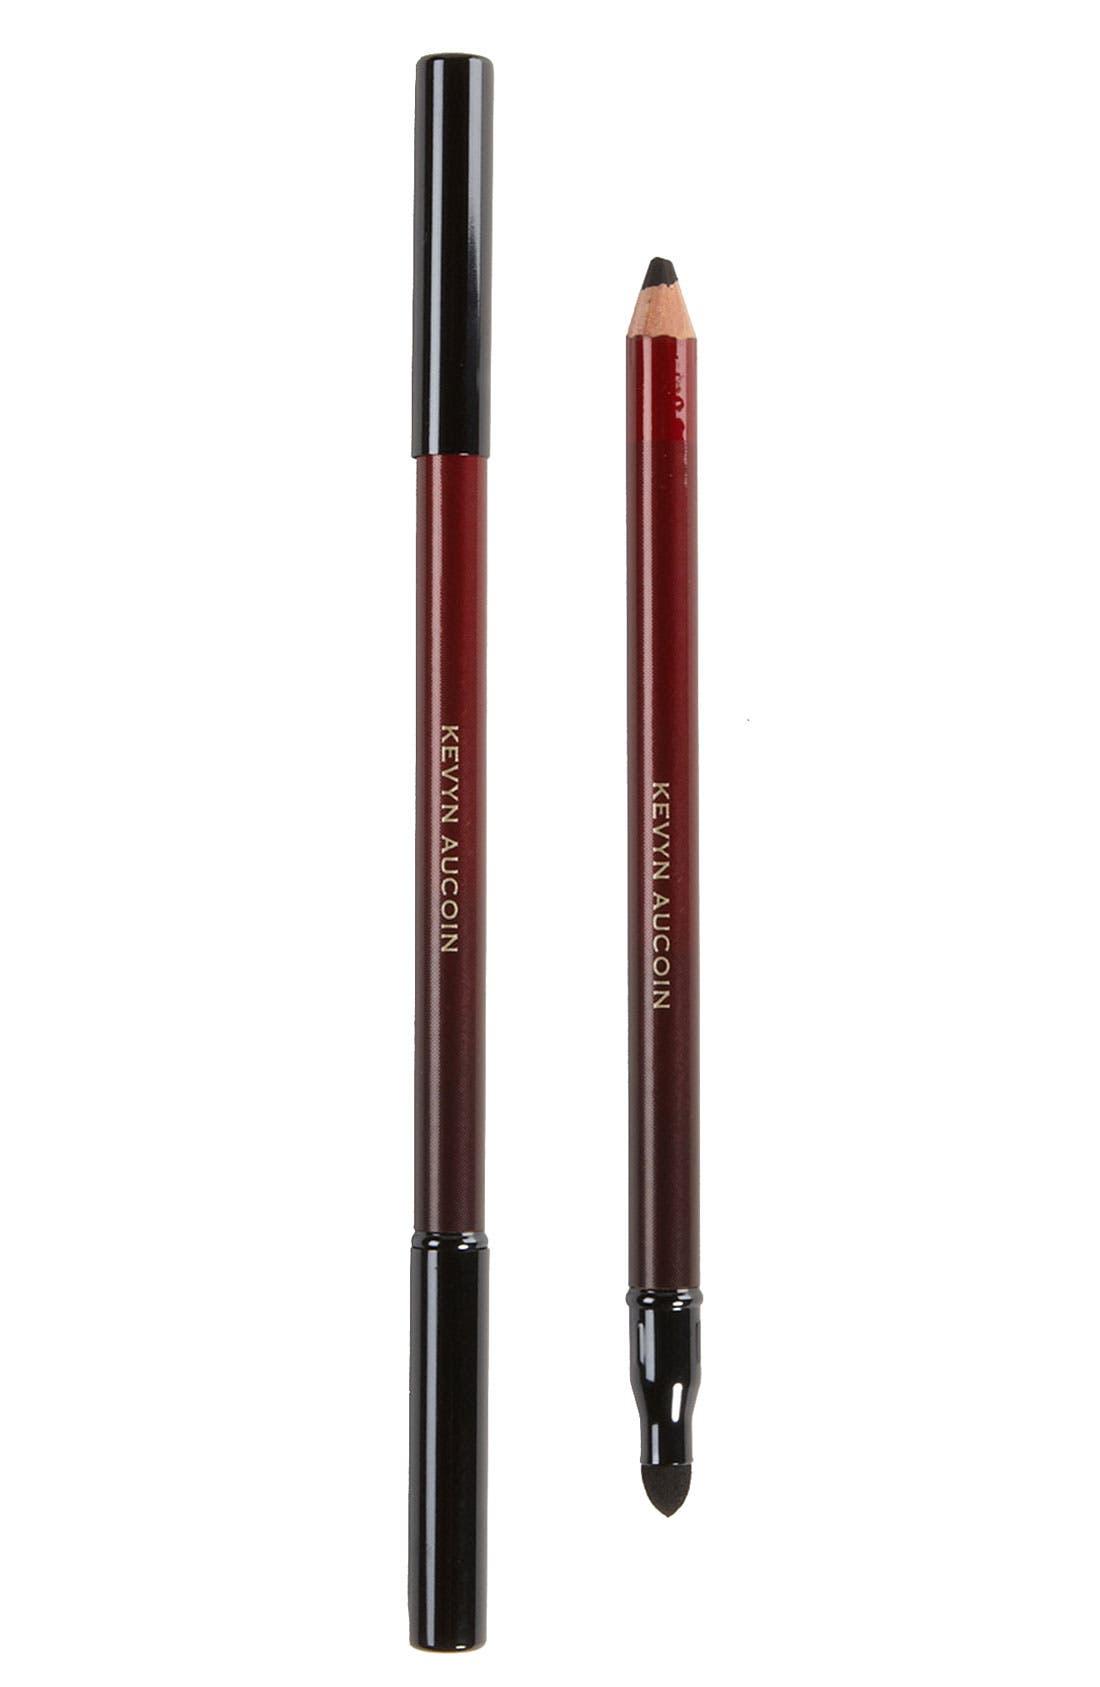 SPACE.NK.apothecary Kevyn Aucoin Beauty The Eye Pencil Primatif Pencil Eyeliner,                             Main thumbnail 1, color,                             BASIC BLACK